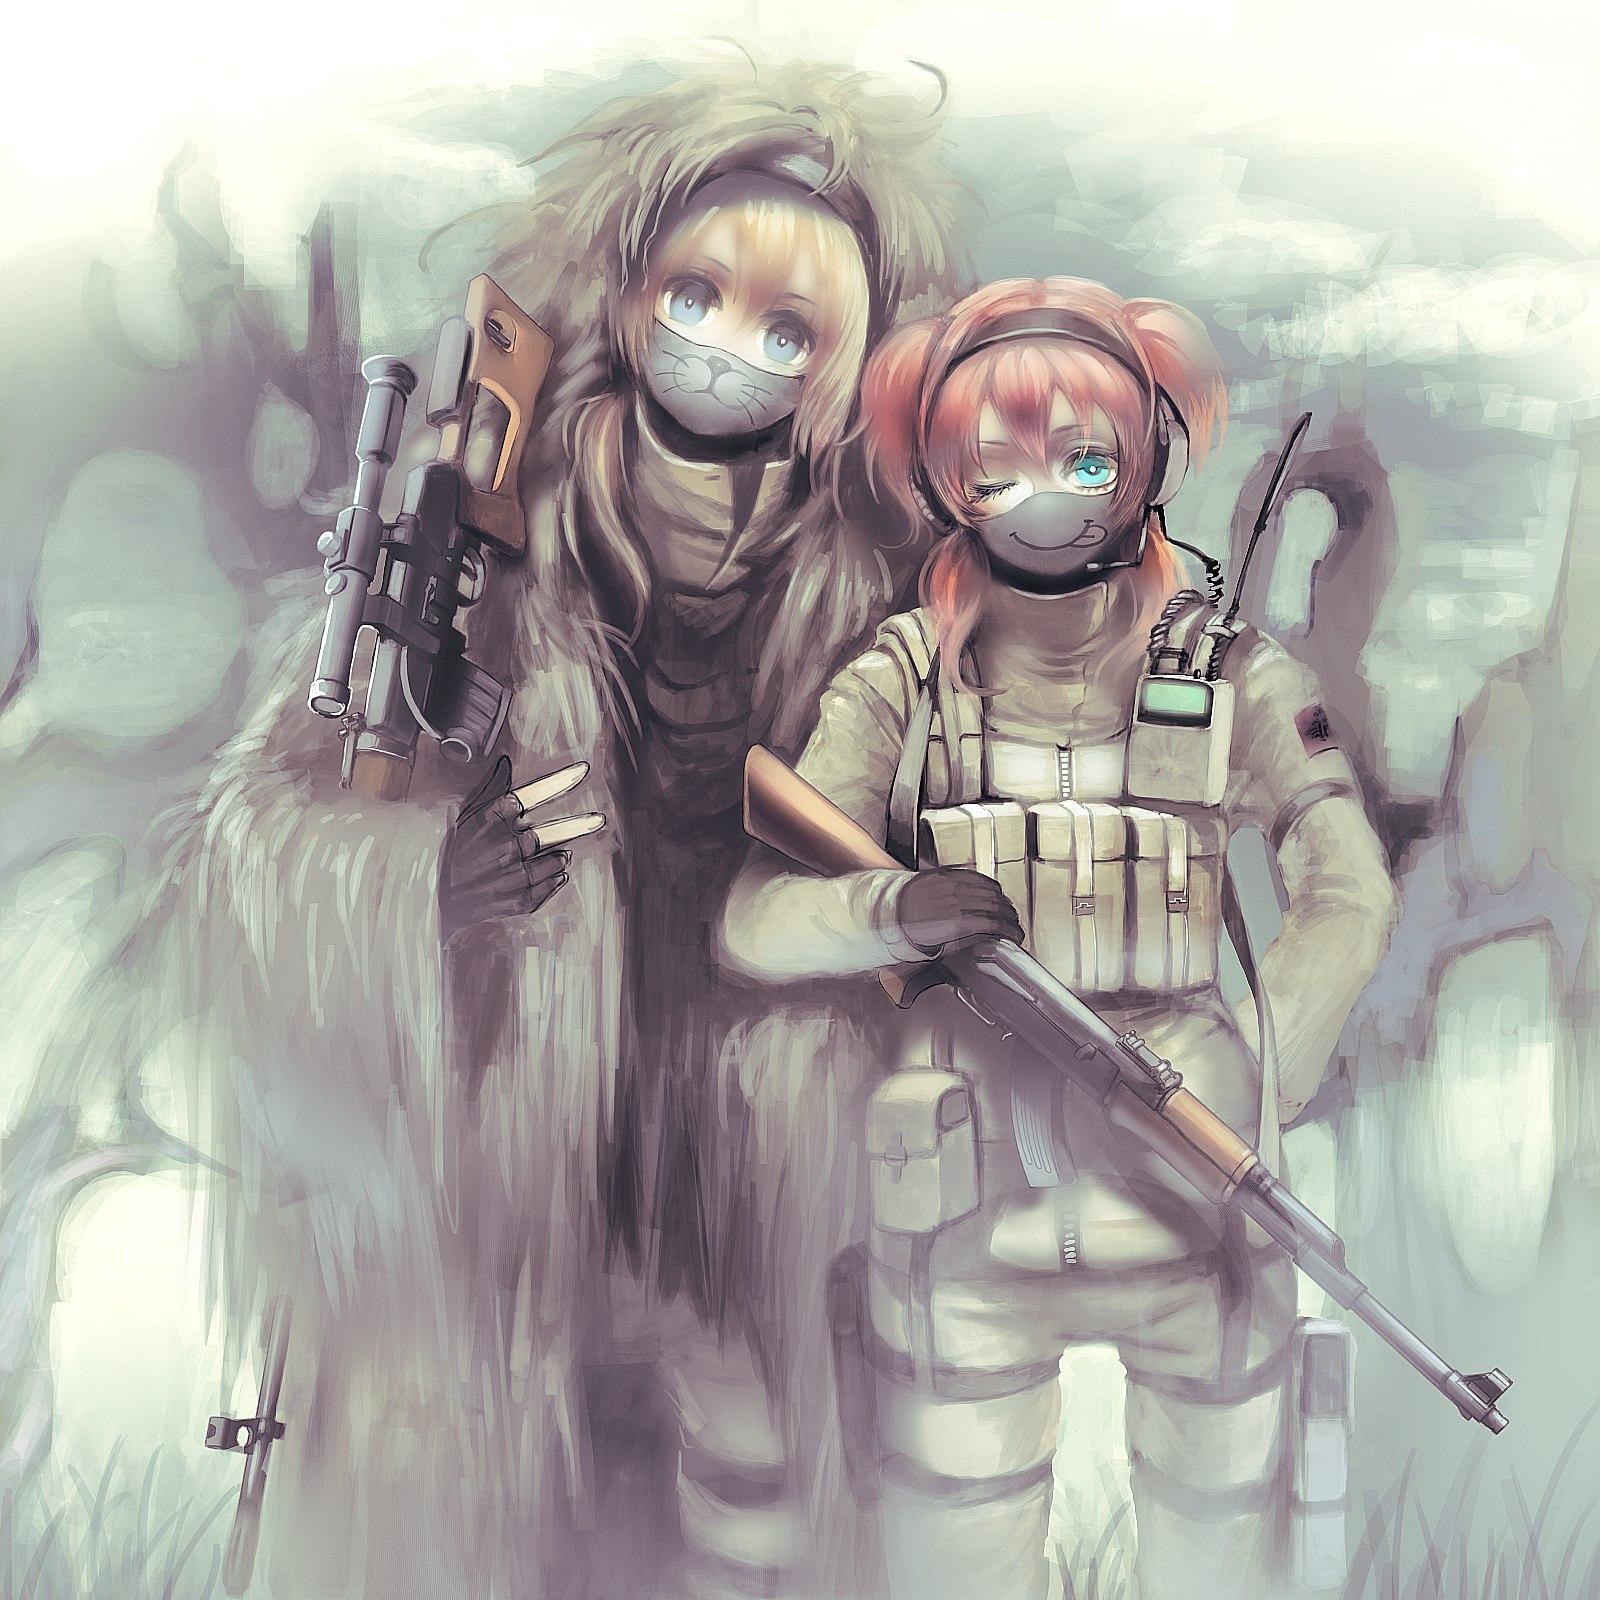 Military art - - Аниме, арт